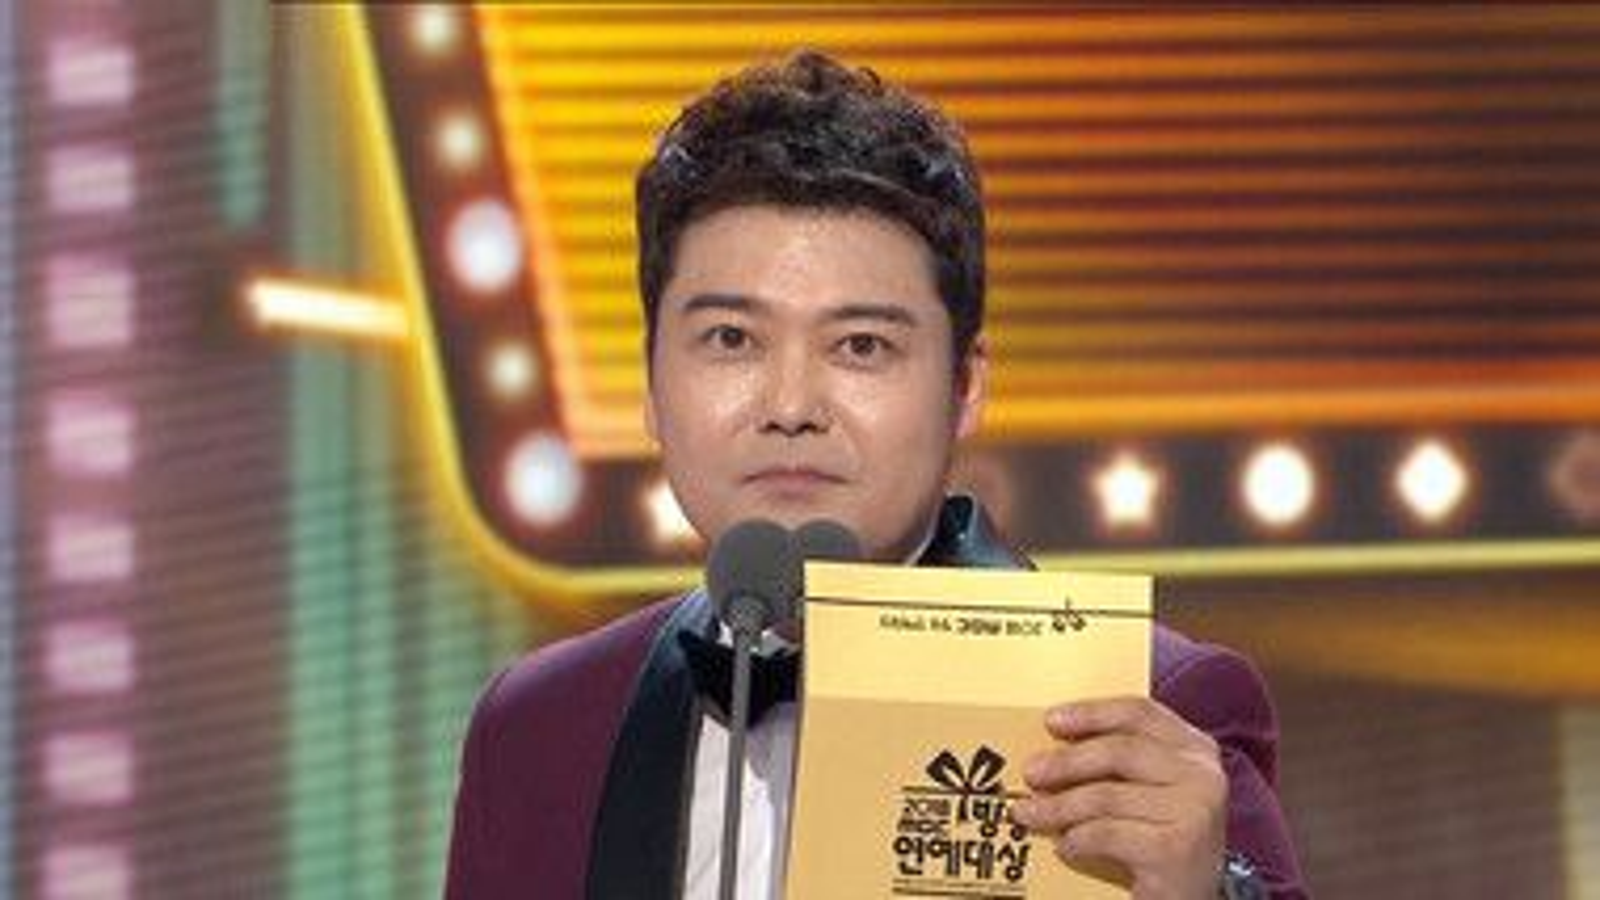 2018 MBC Entertainment Awards Episode 2